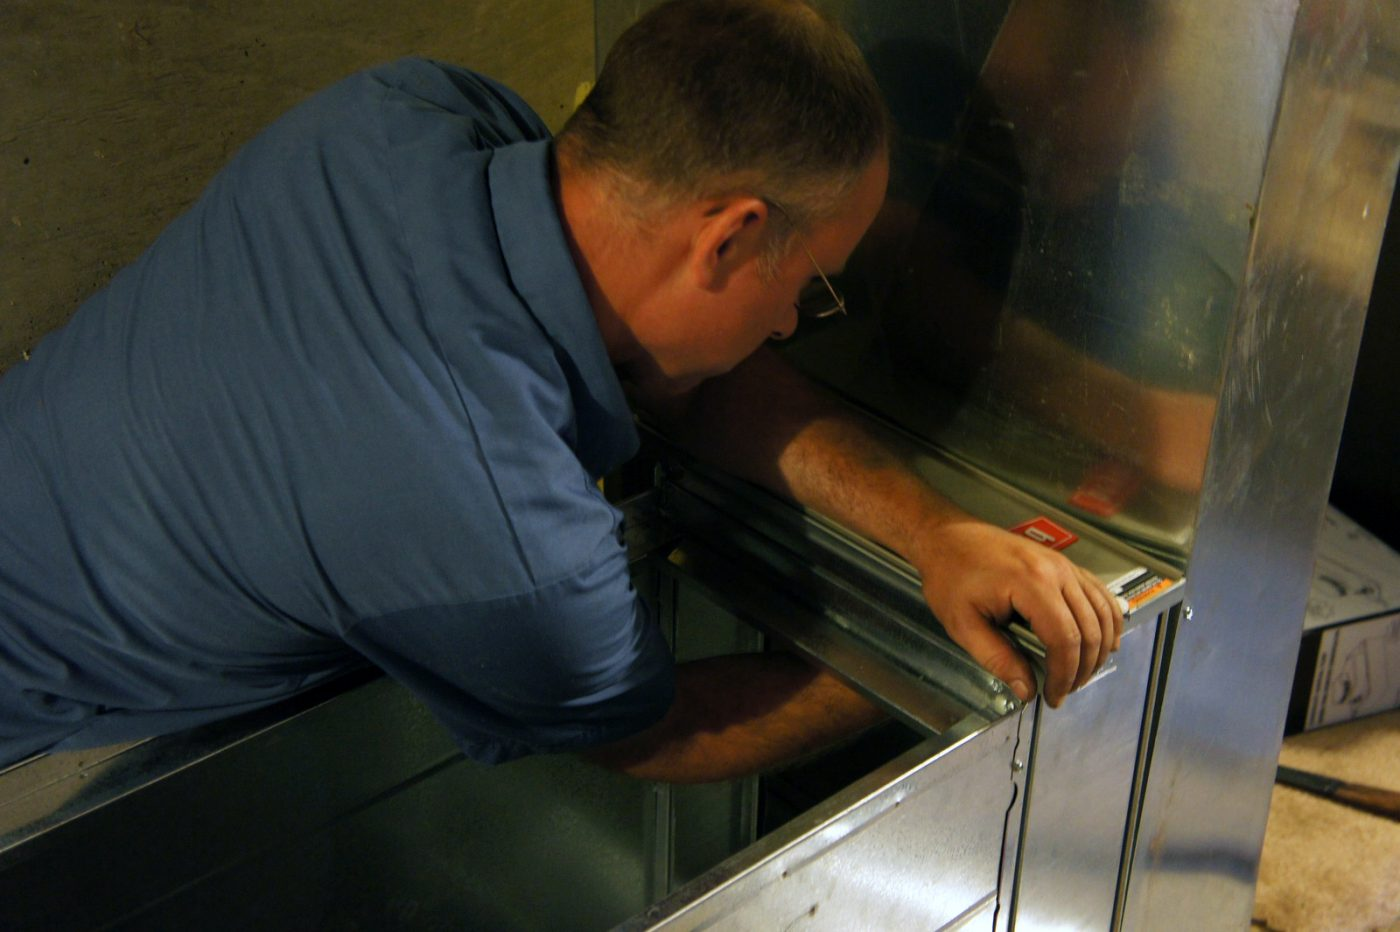 Seattle Area Furnace & Heating Repair Service